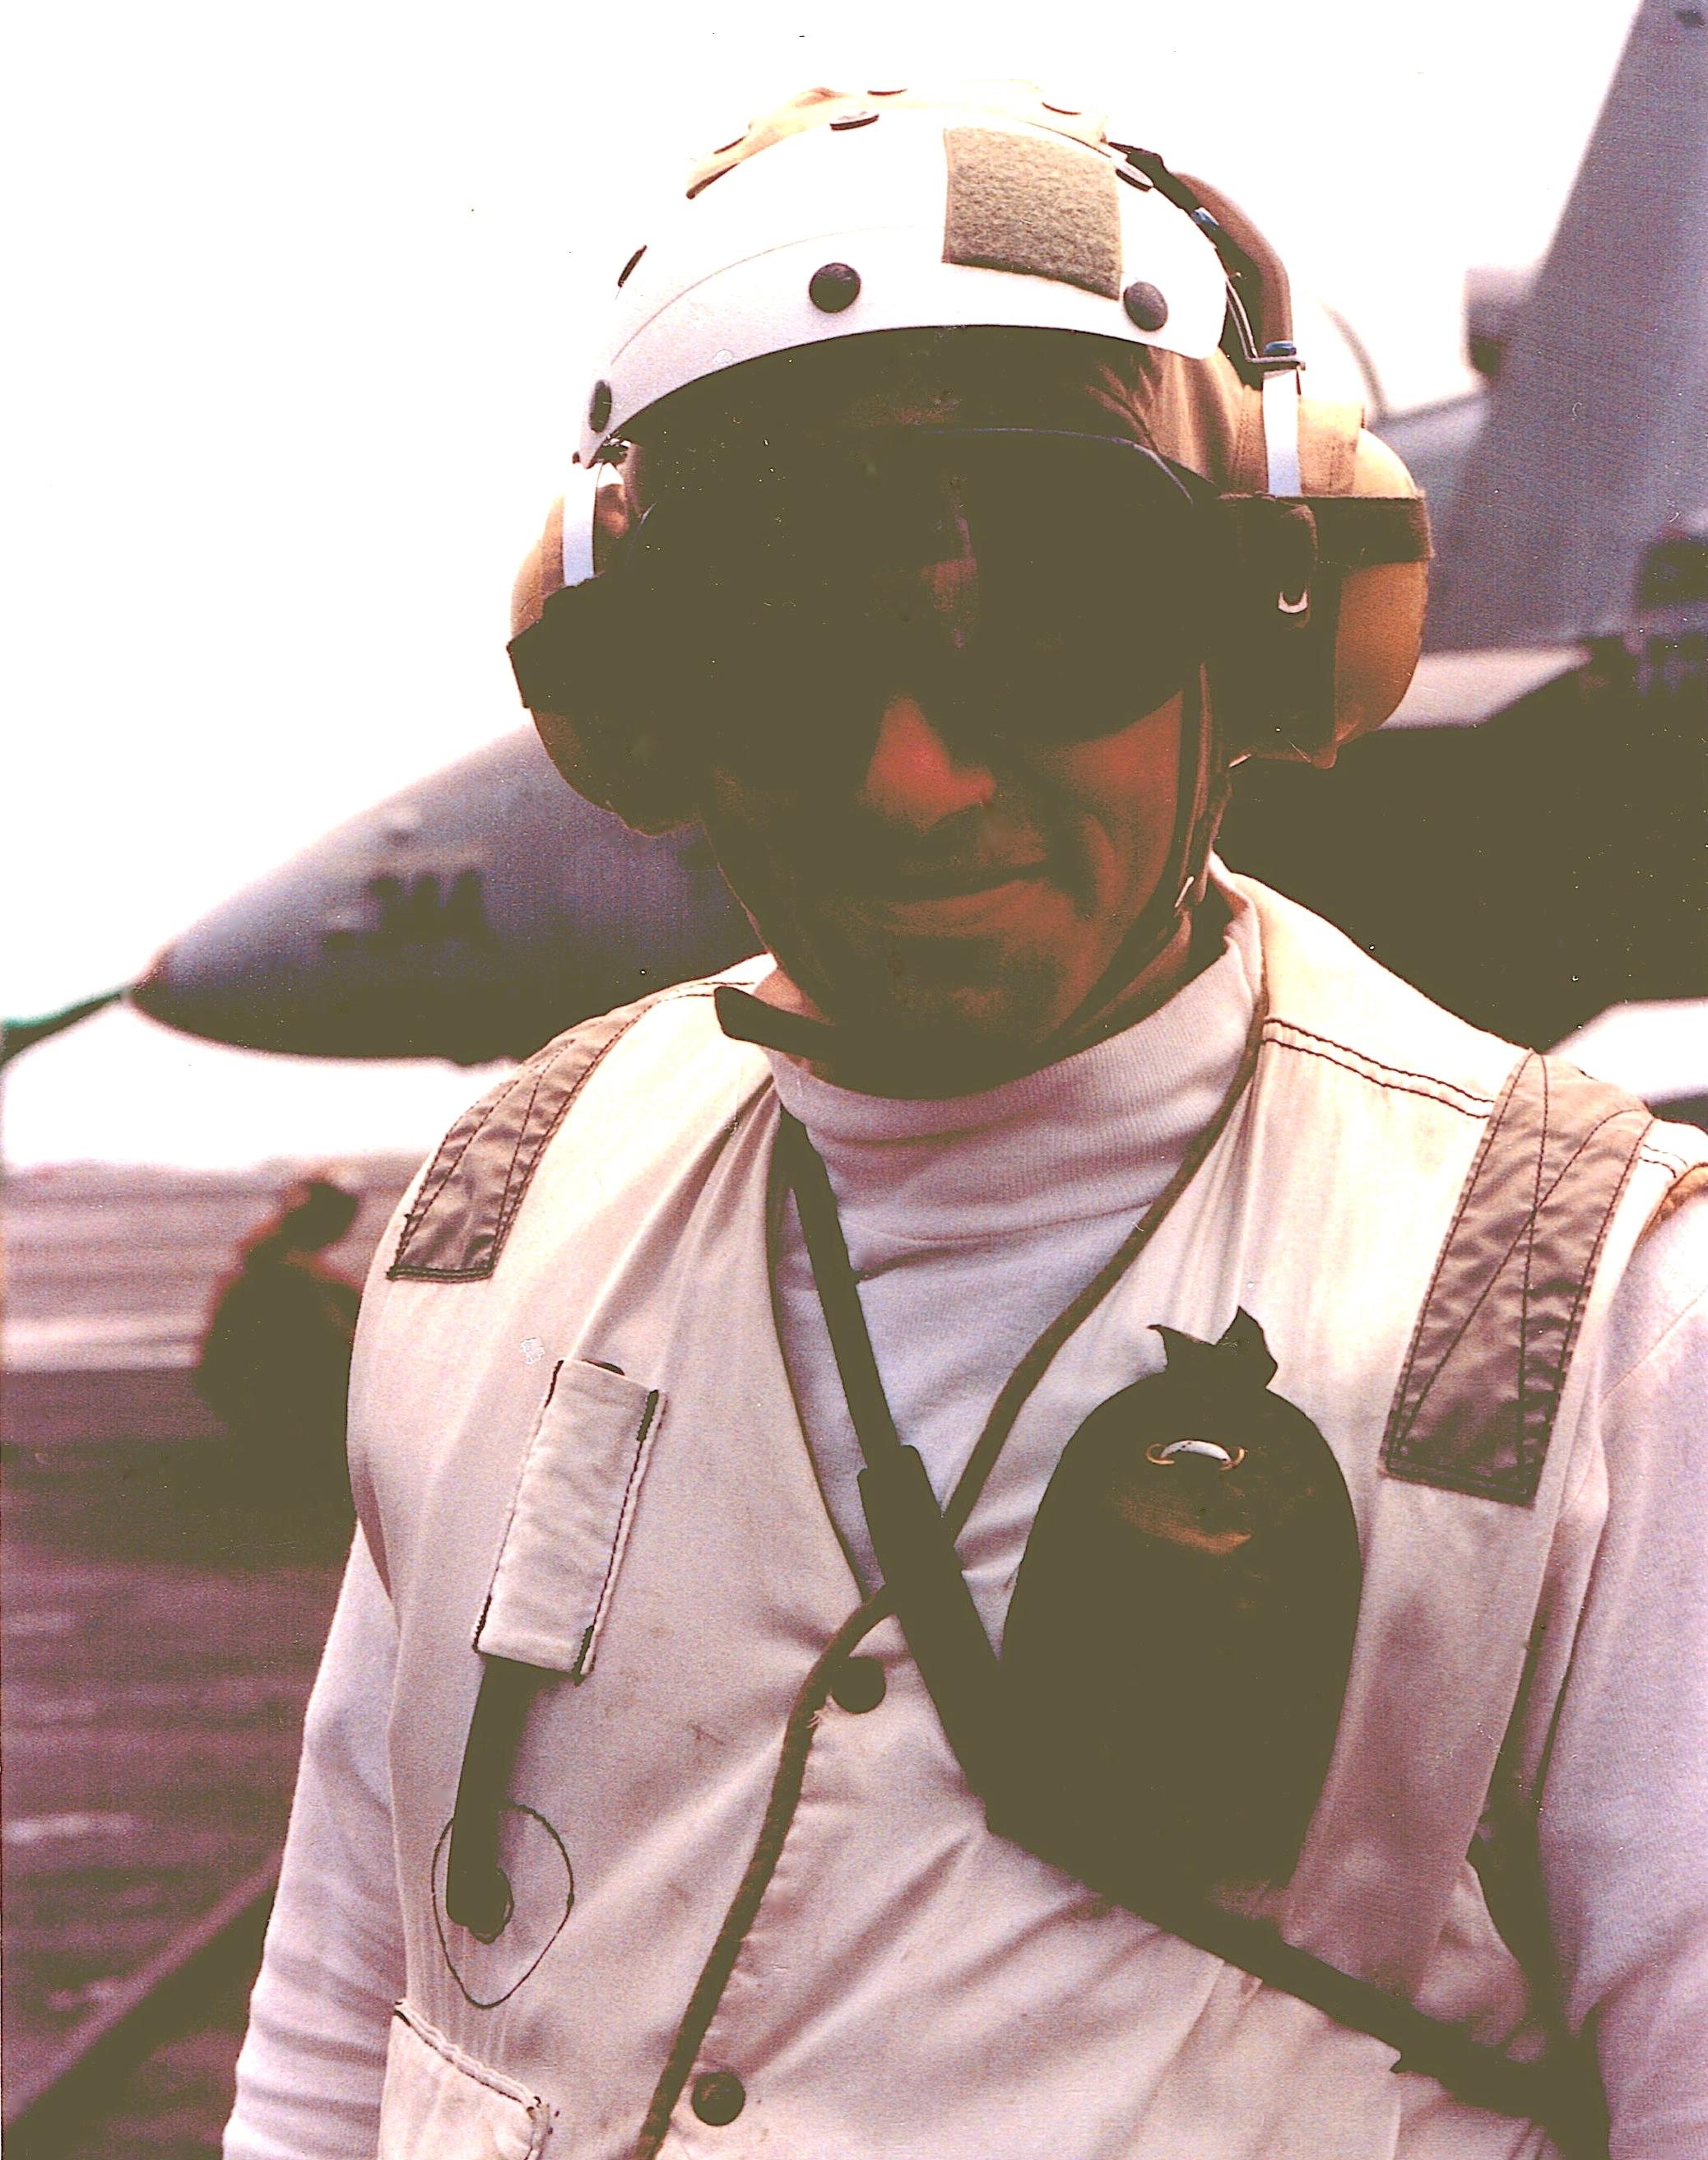 Photo_Dugan on aircraft carrier deck copy - Version 2 copy.jpg